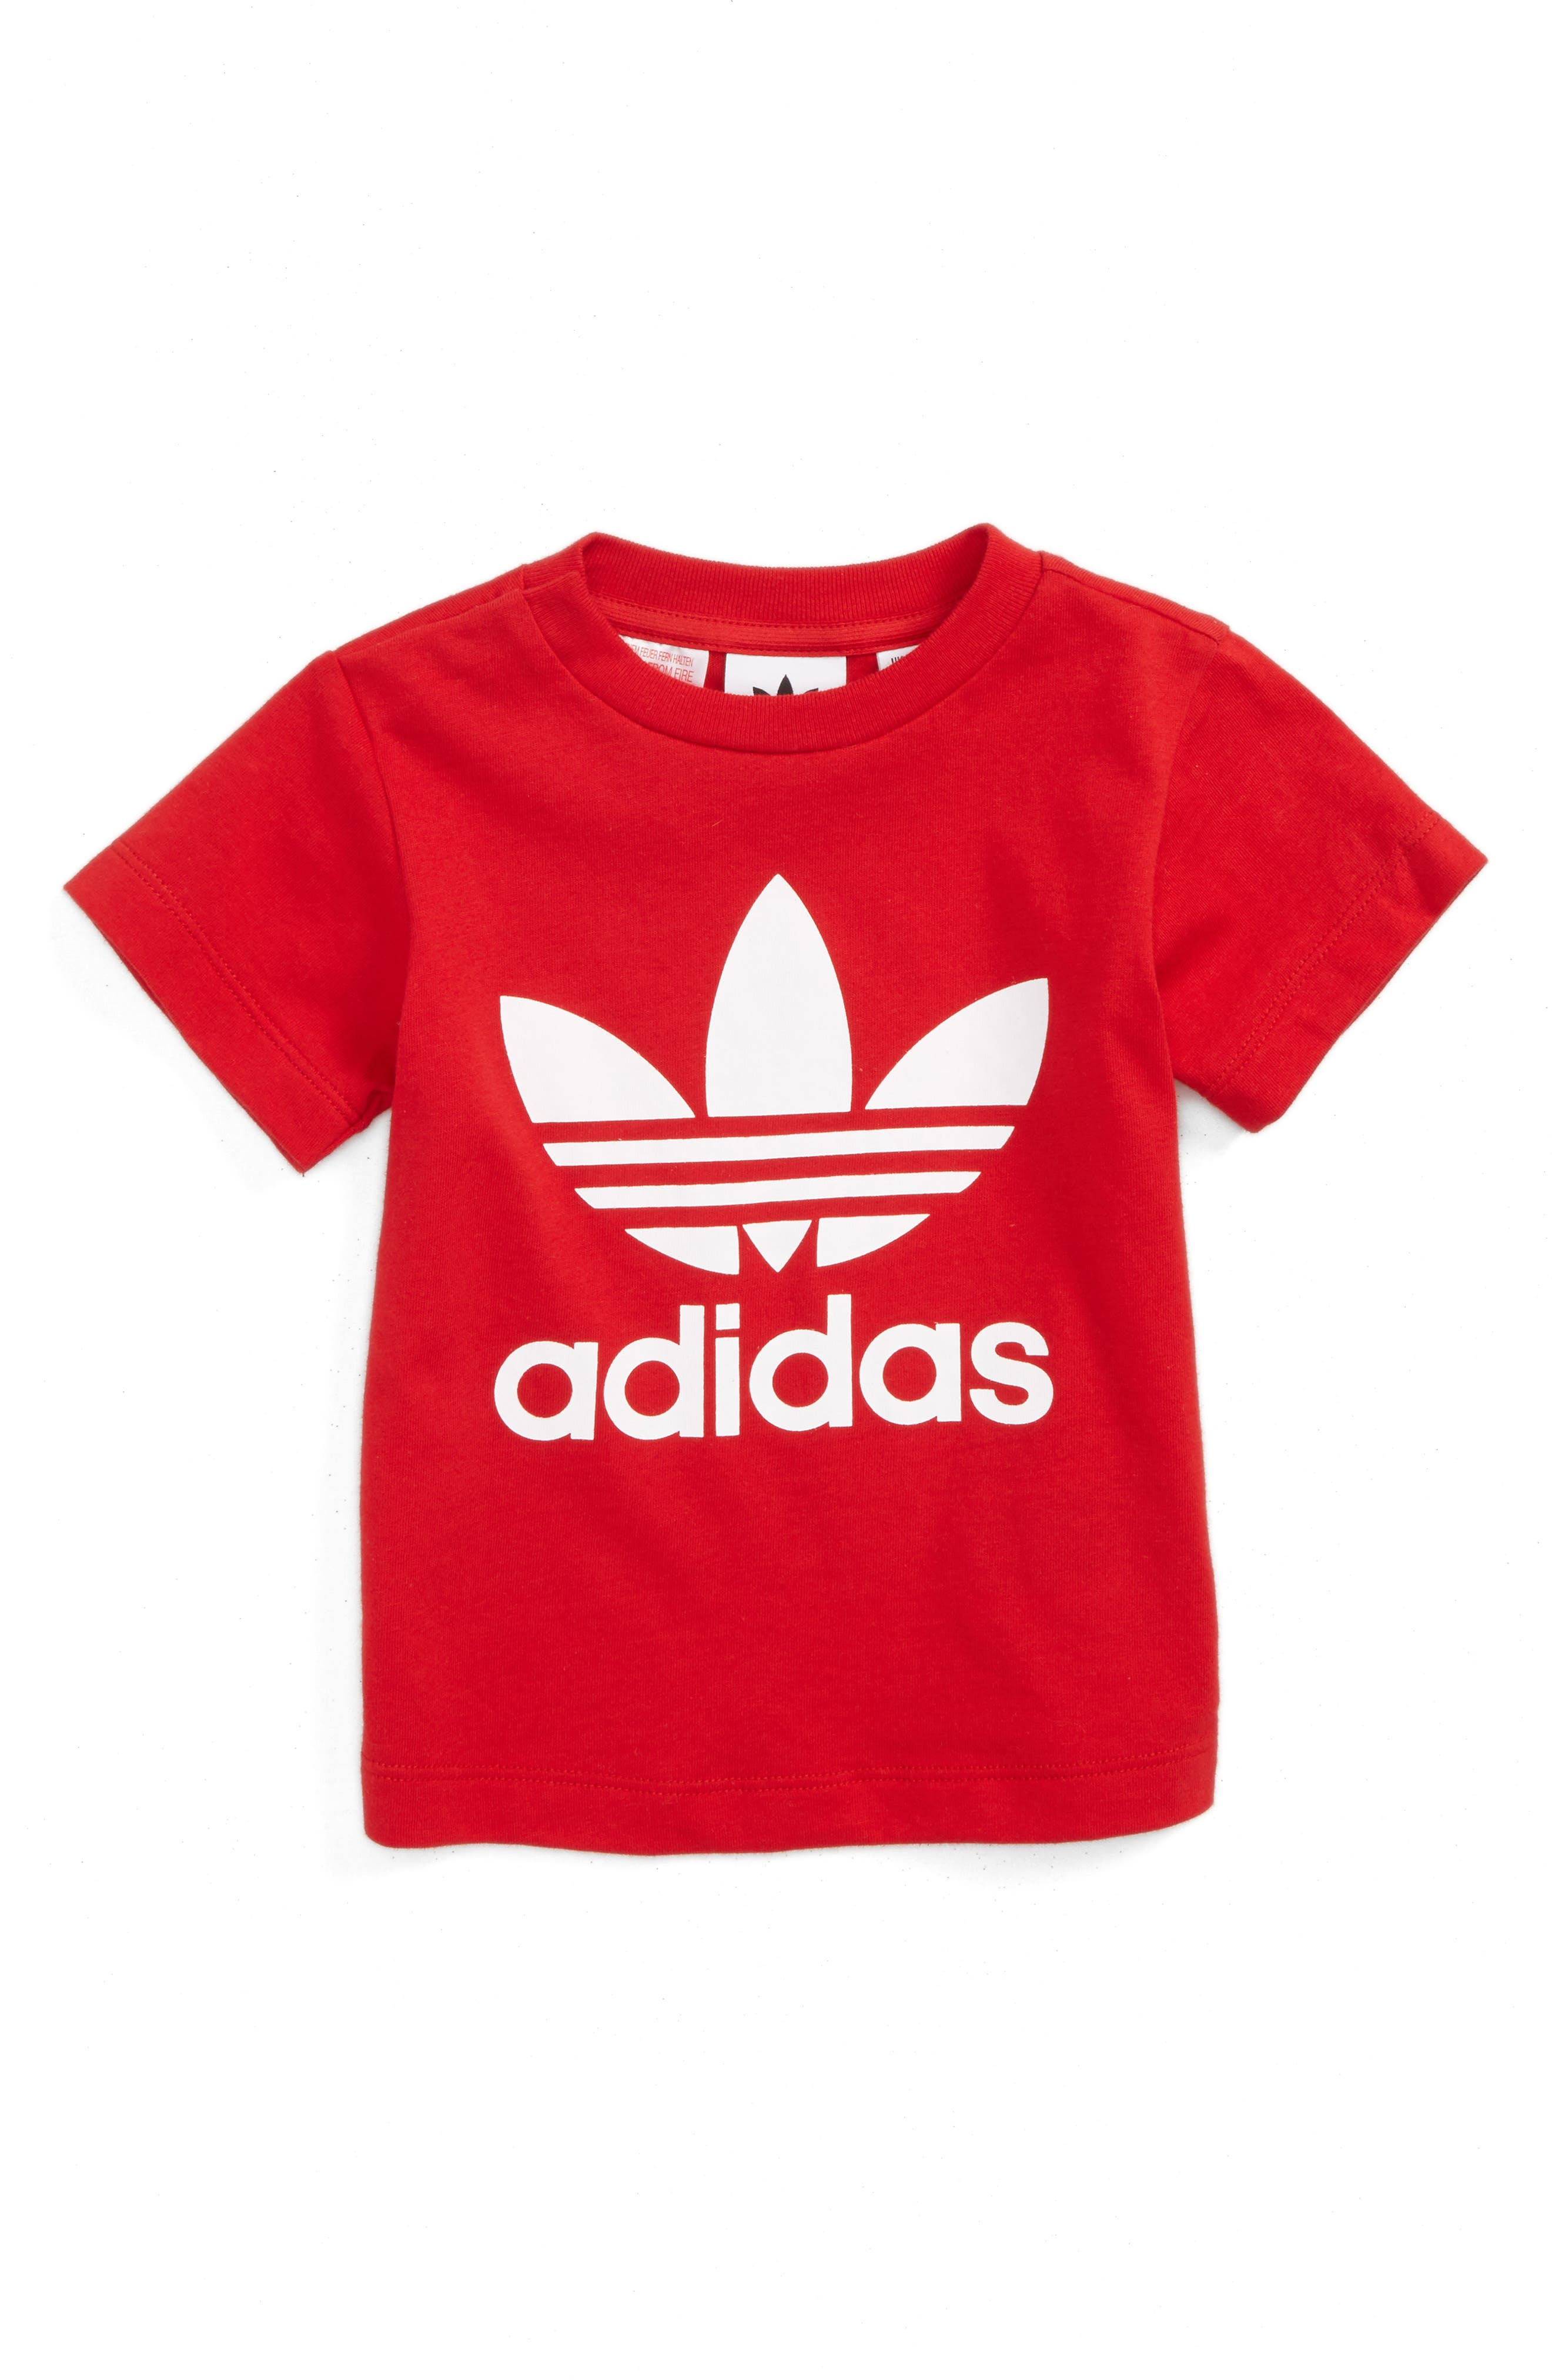 Main Image - adidas Originals Trefoil Logo Tee (Baby)